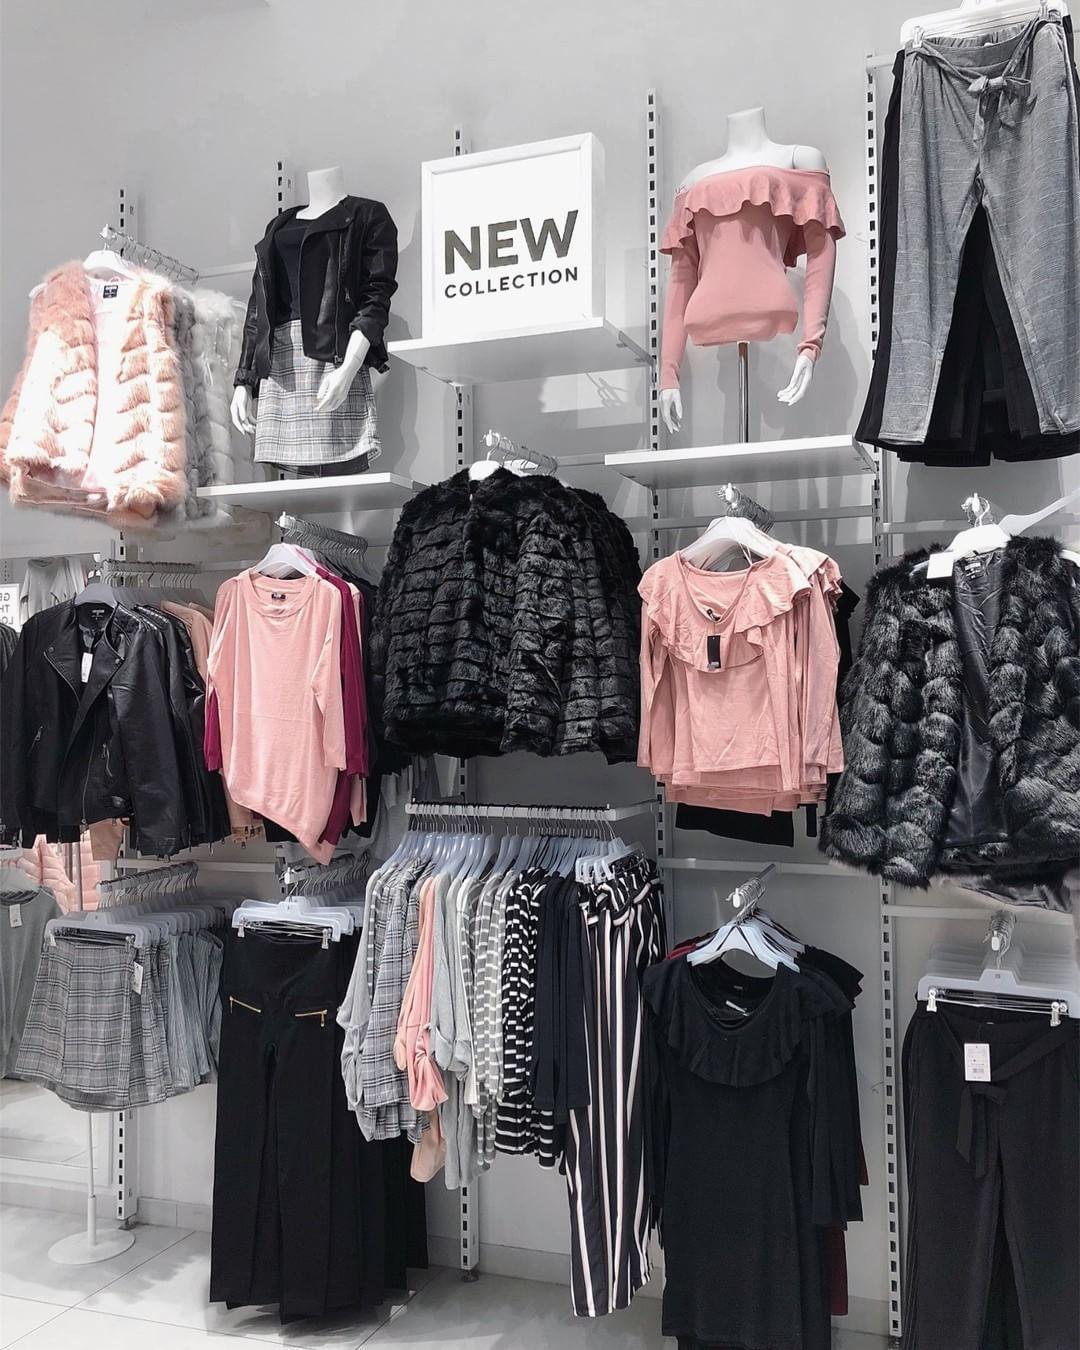 new new new! 💓#mycolloseum #aw18 #fashion #rose #grey